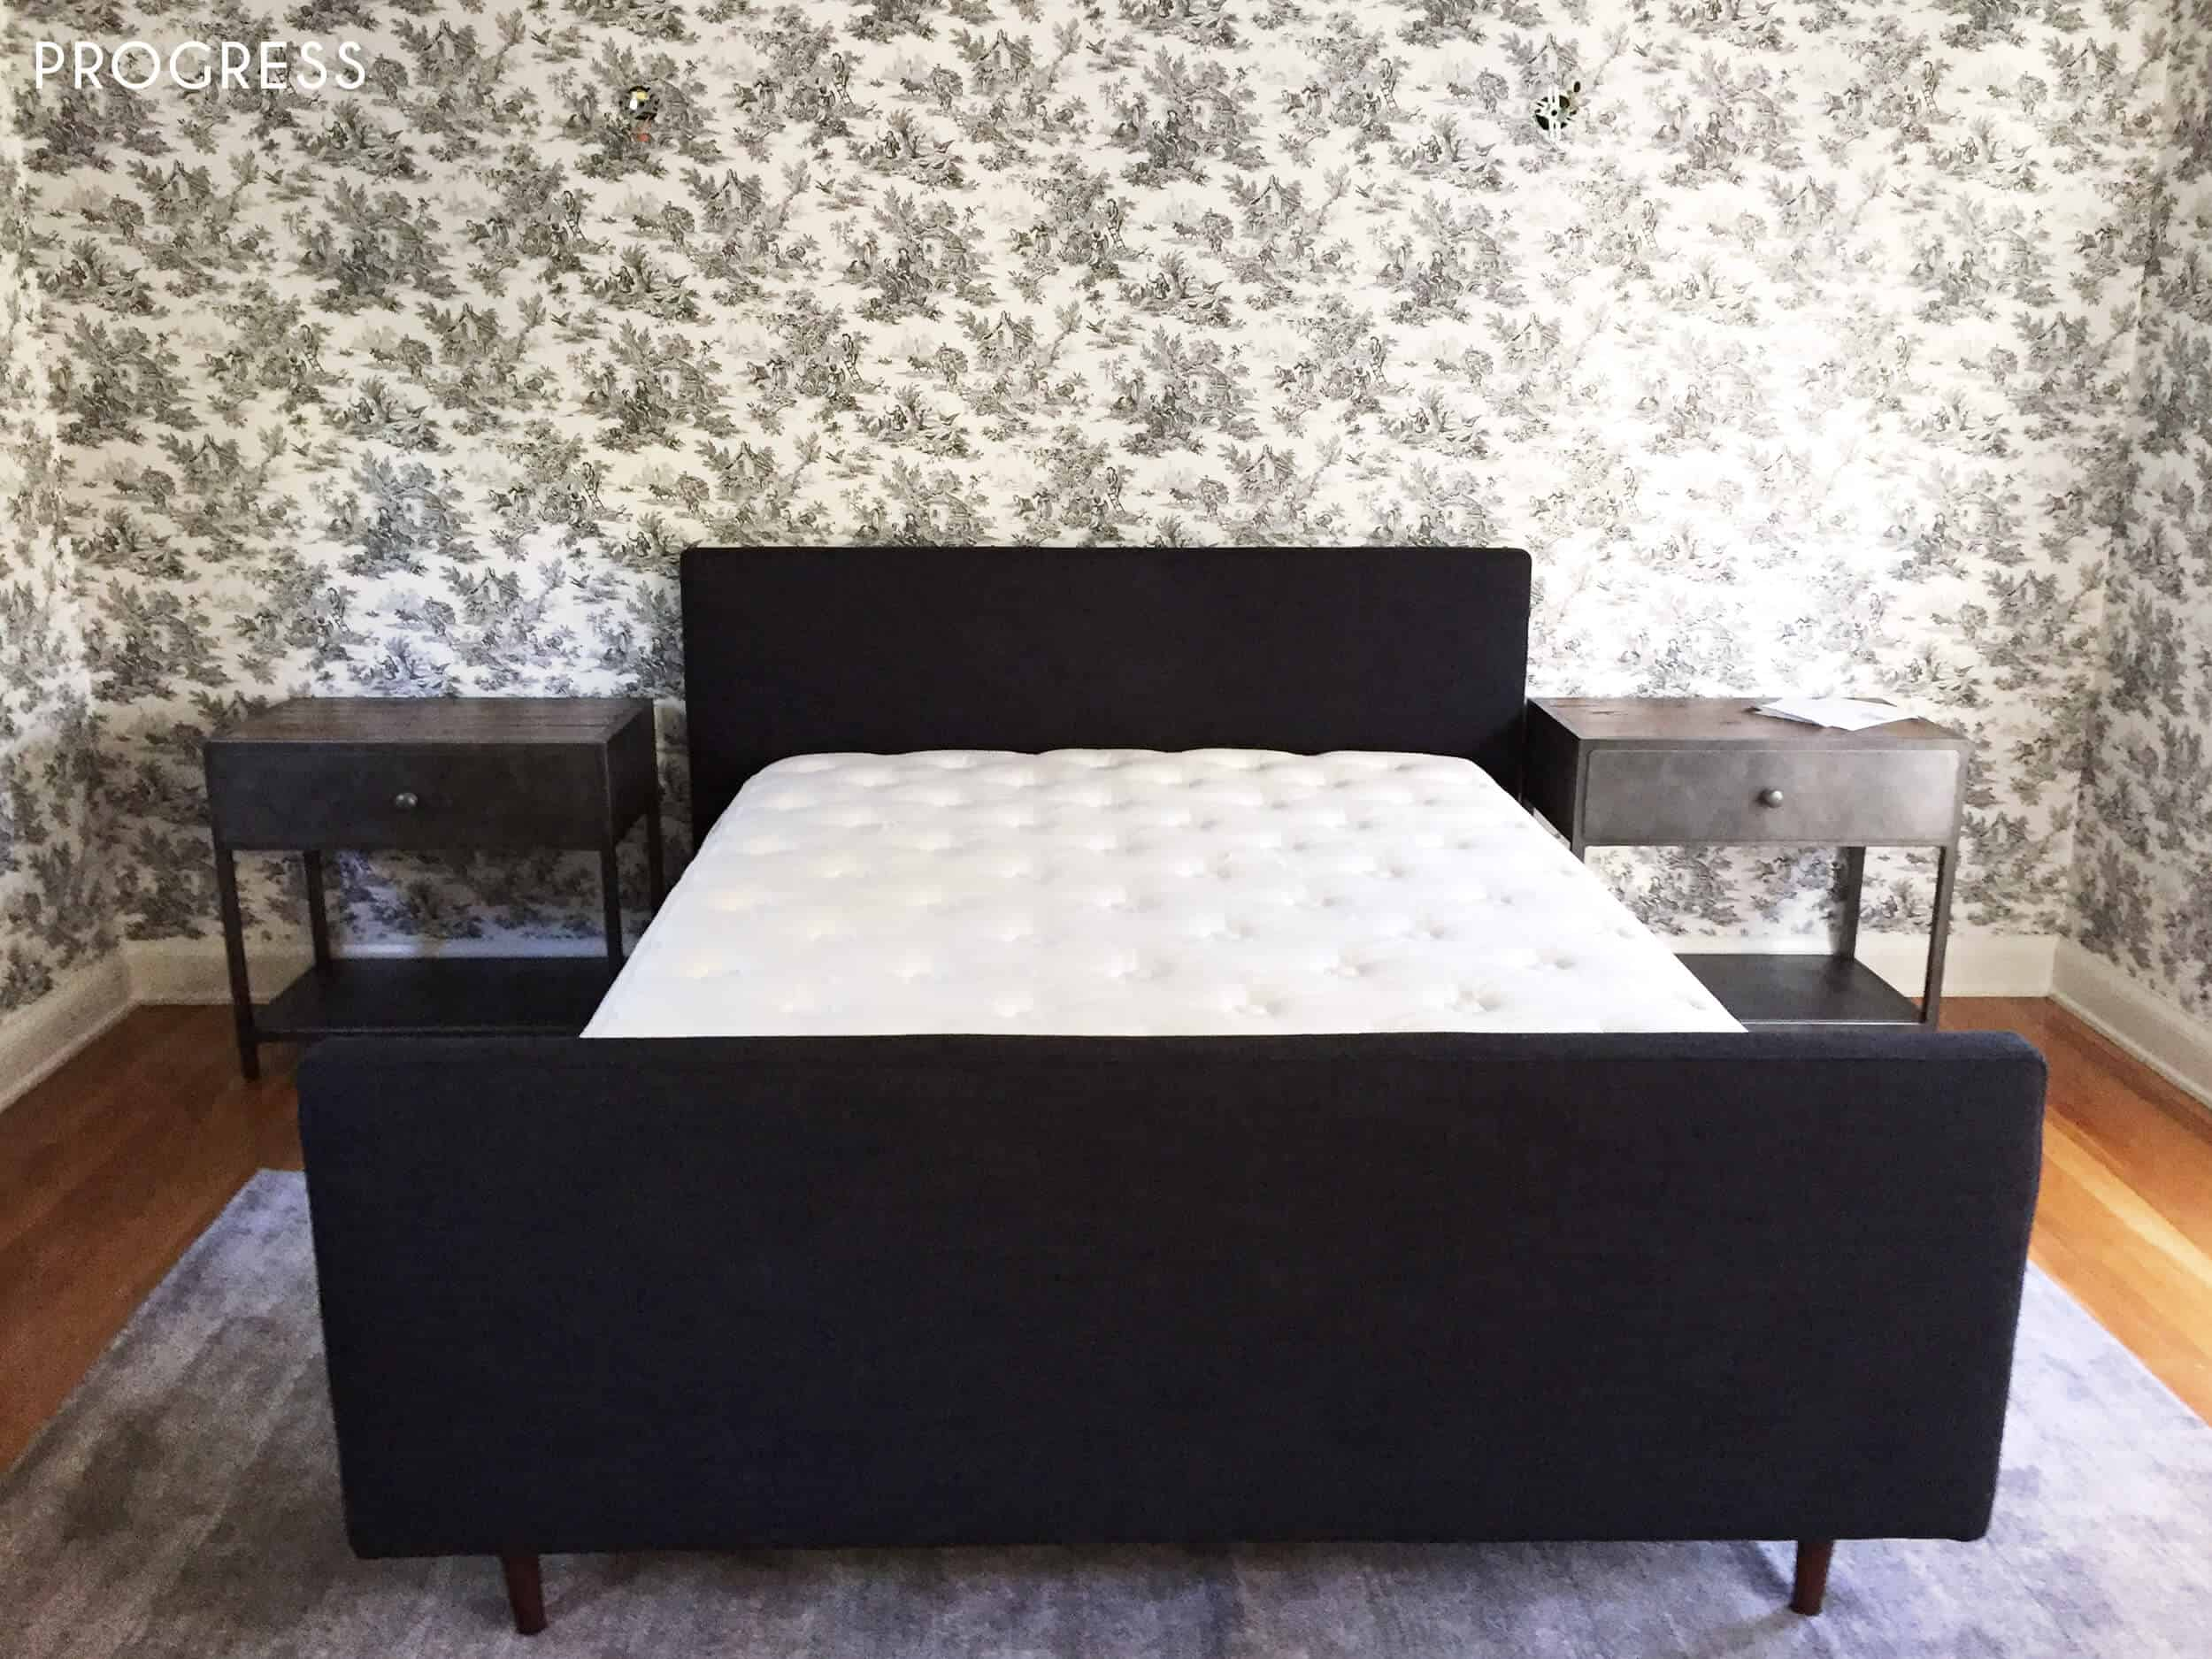 Guest Bedroom_Traditional Eclectic_Industrial_Modern_Toile_Wallpaper_Progress_1